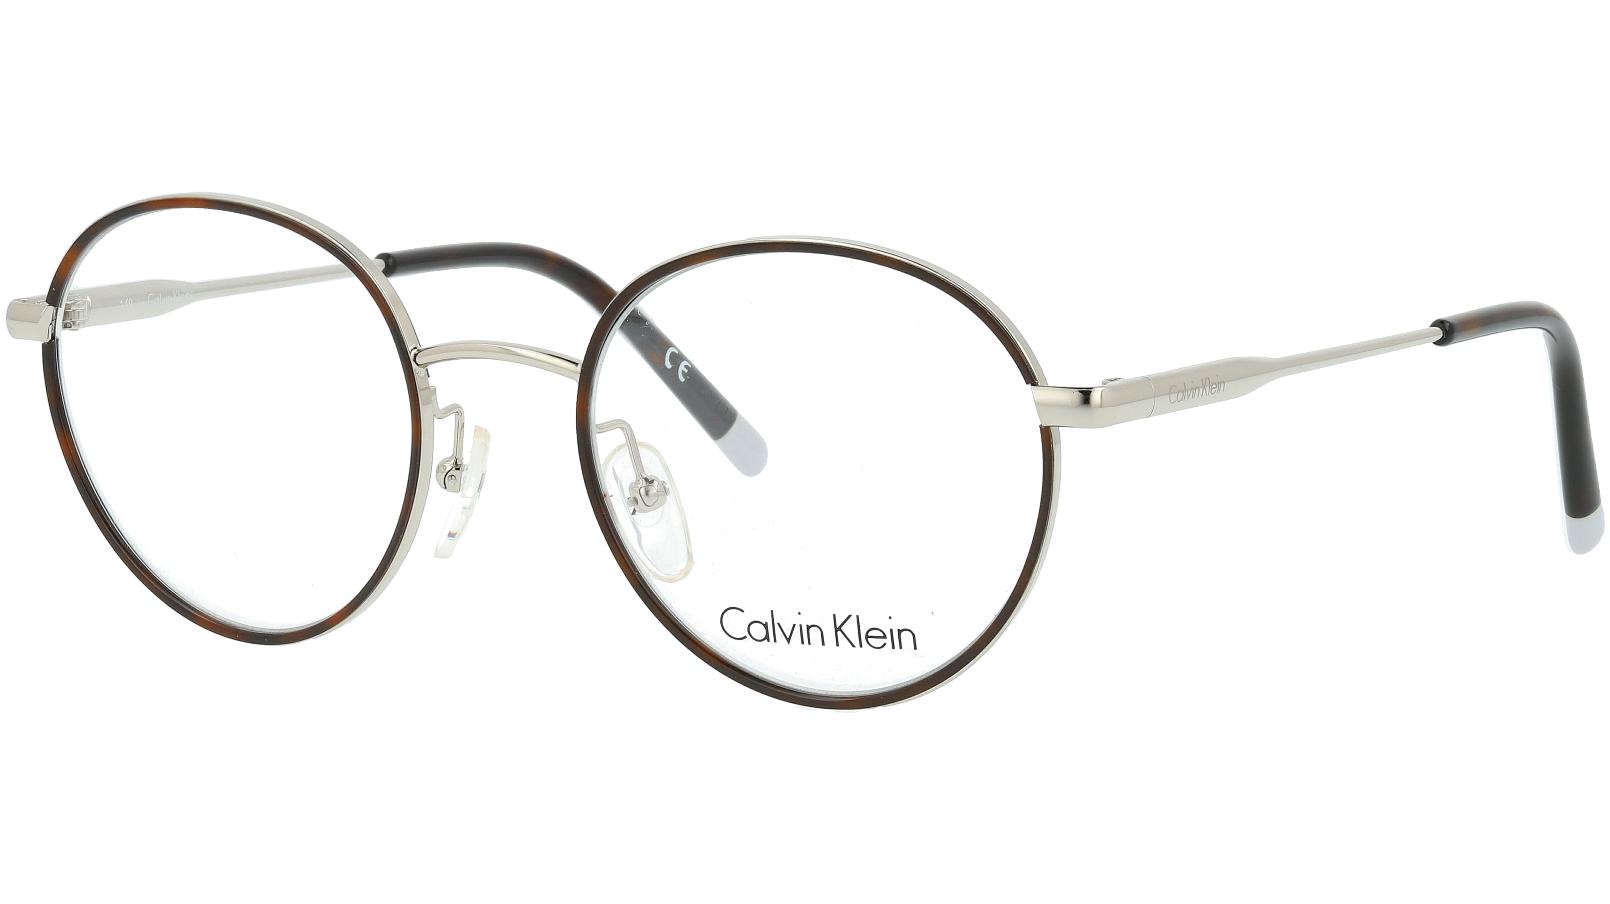 Calvin Klein CK5449 046 50 Silver Glasses